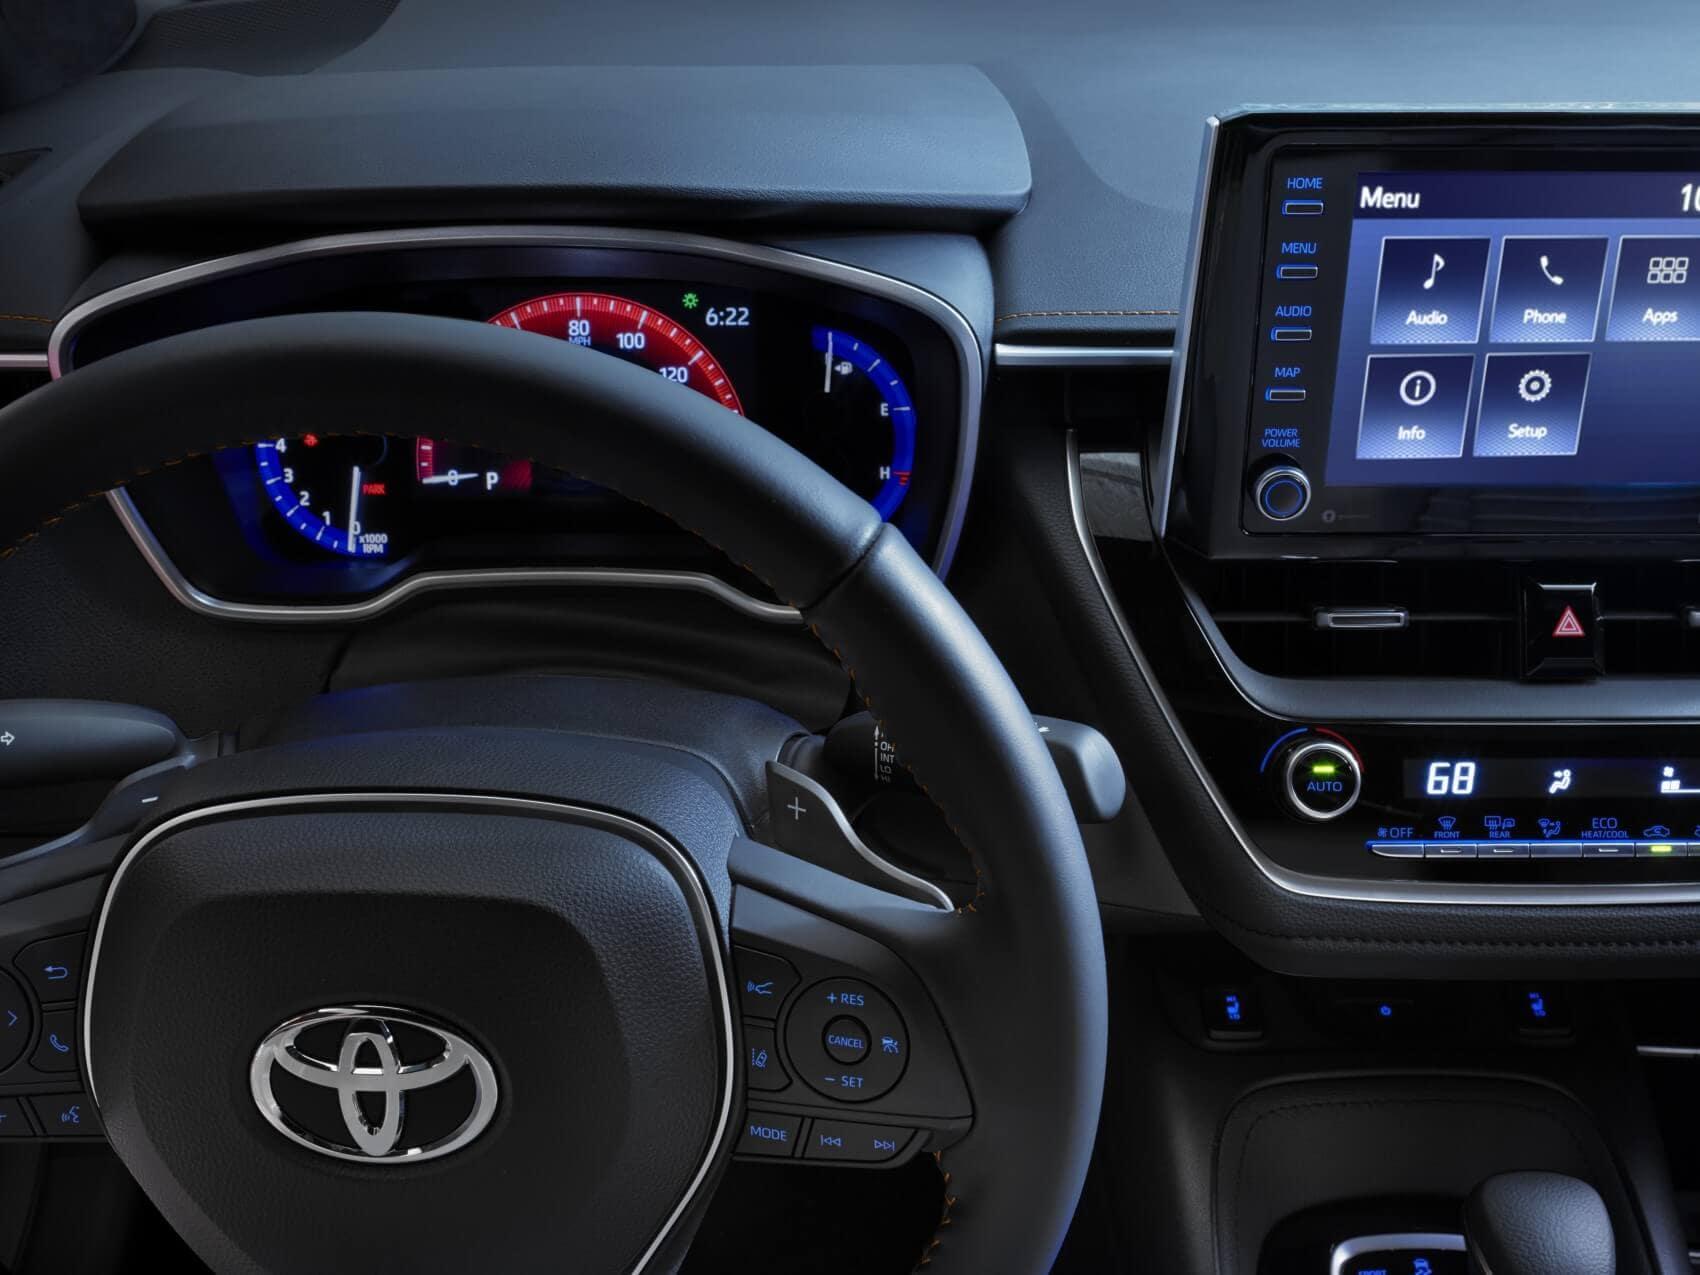 Toyota Corolla vs Nissan Sentra Interior